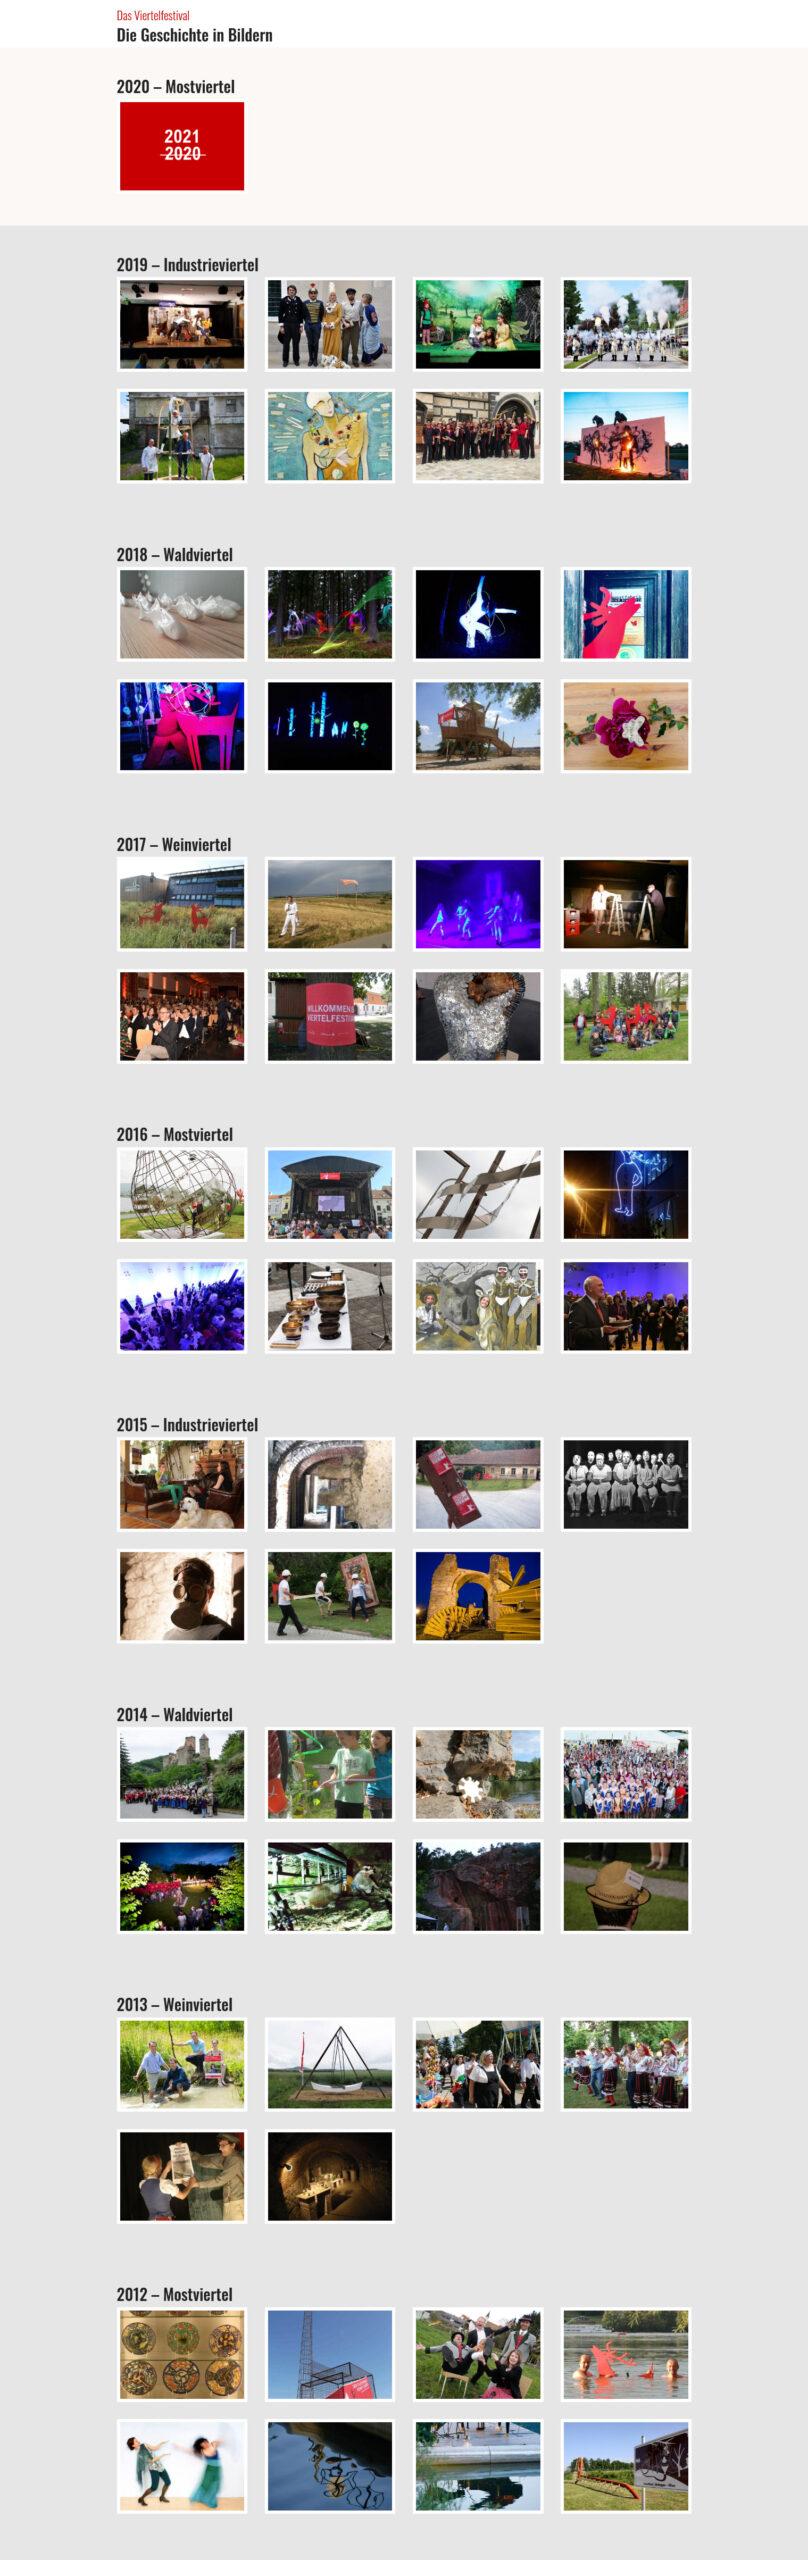 relaunch-website-tierquartier-wien-wissenslexikon-iservice-medien-und-werbeagentur-wien